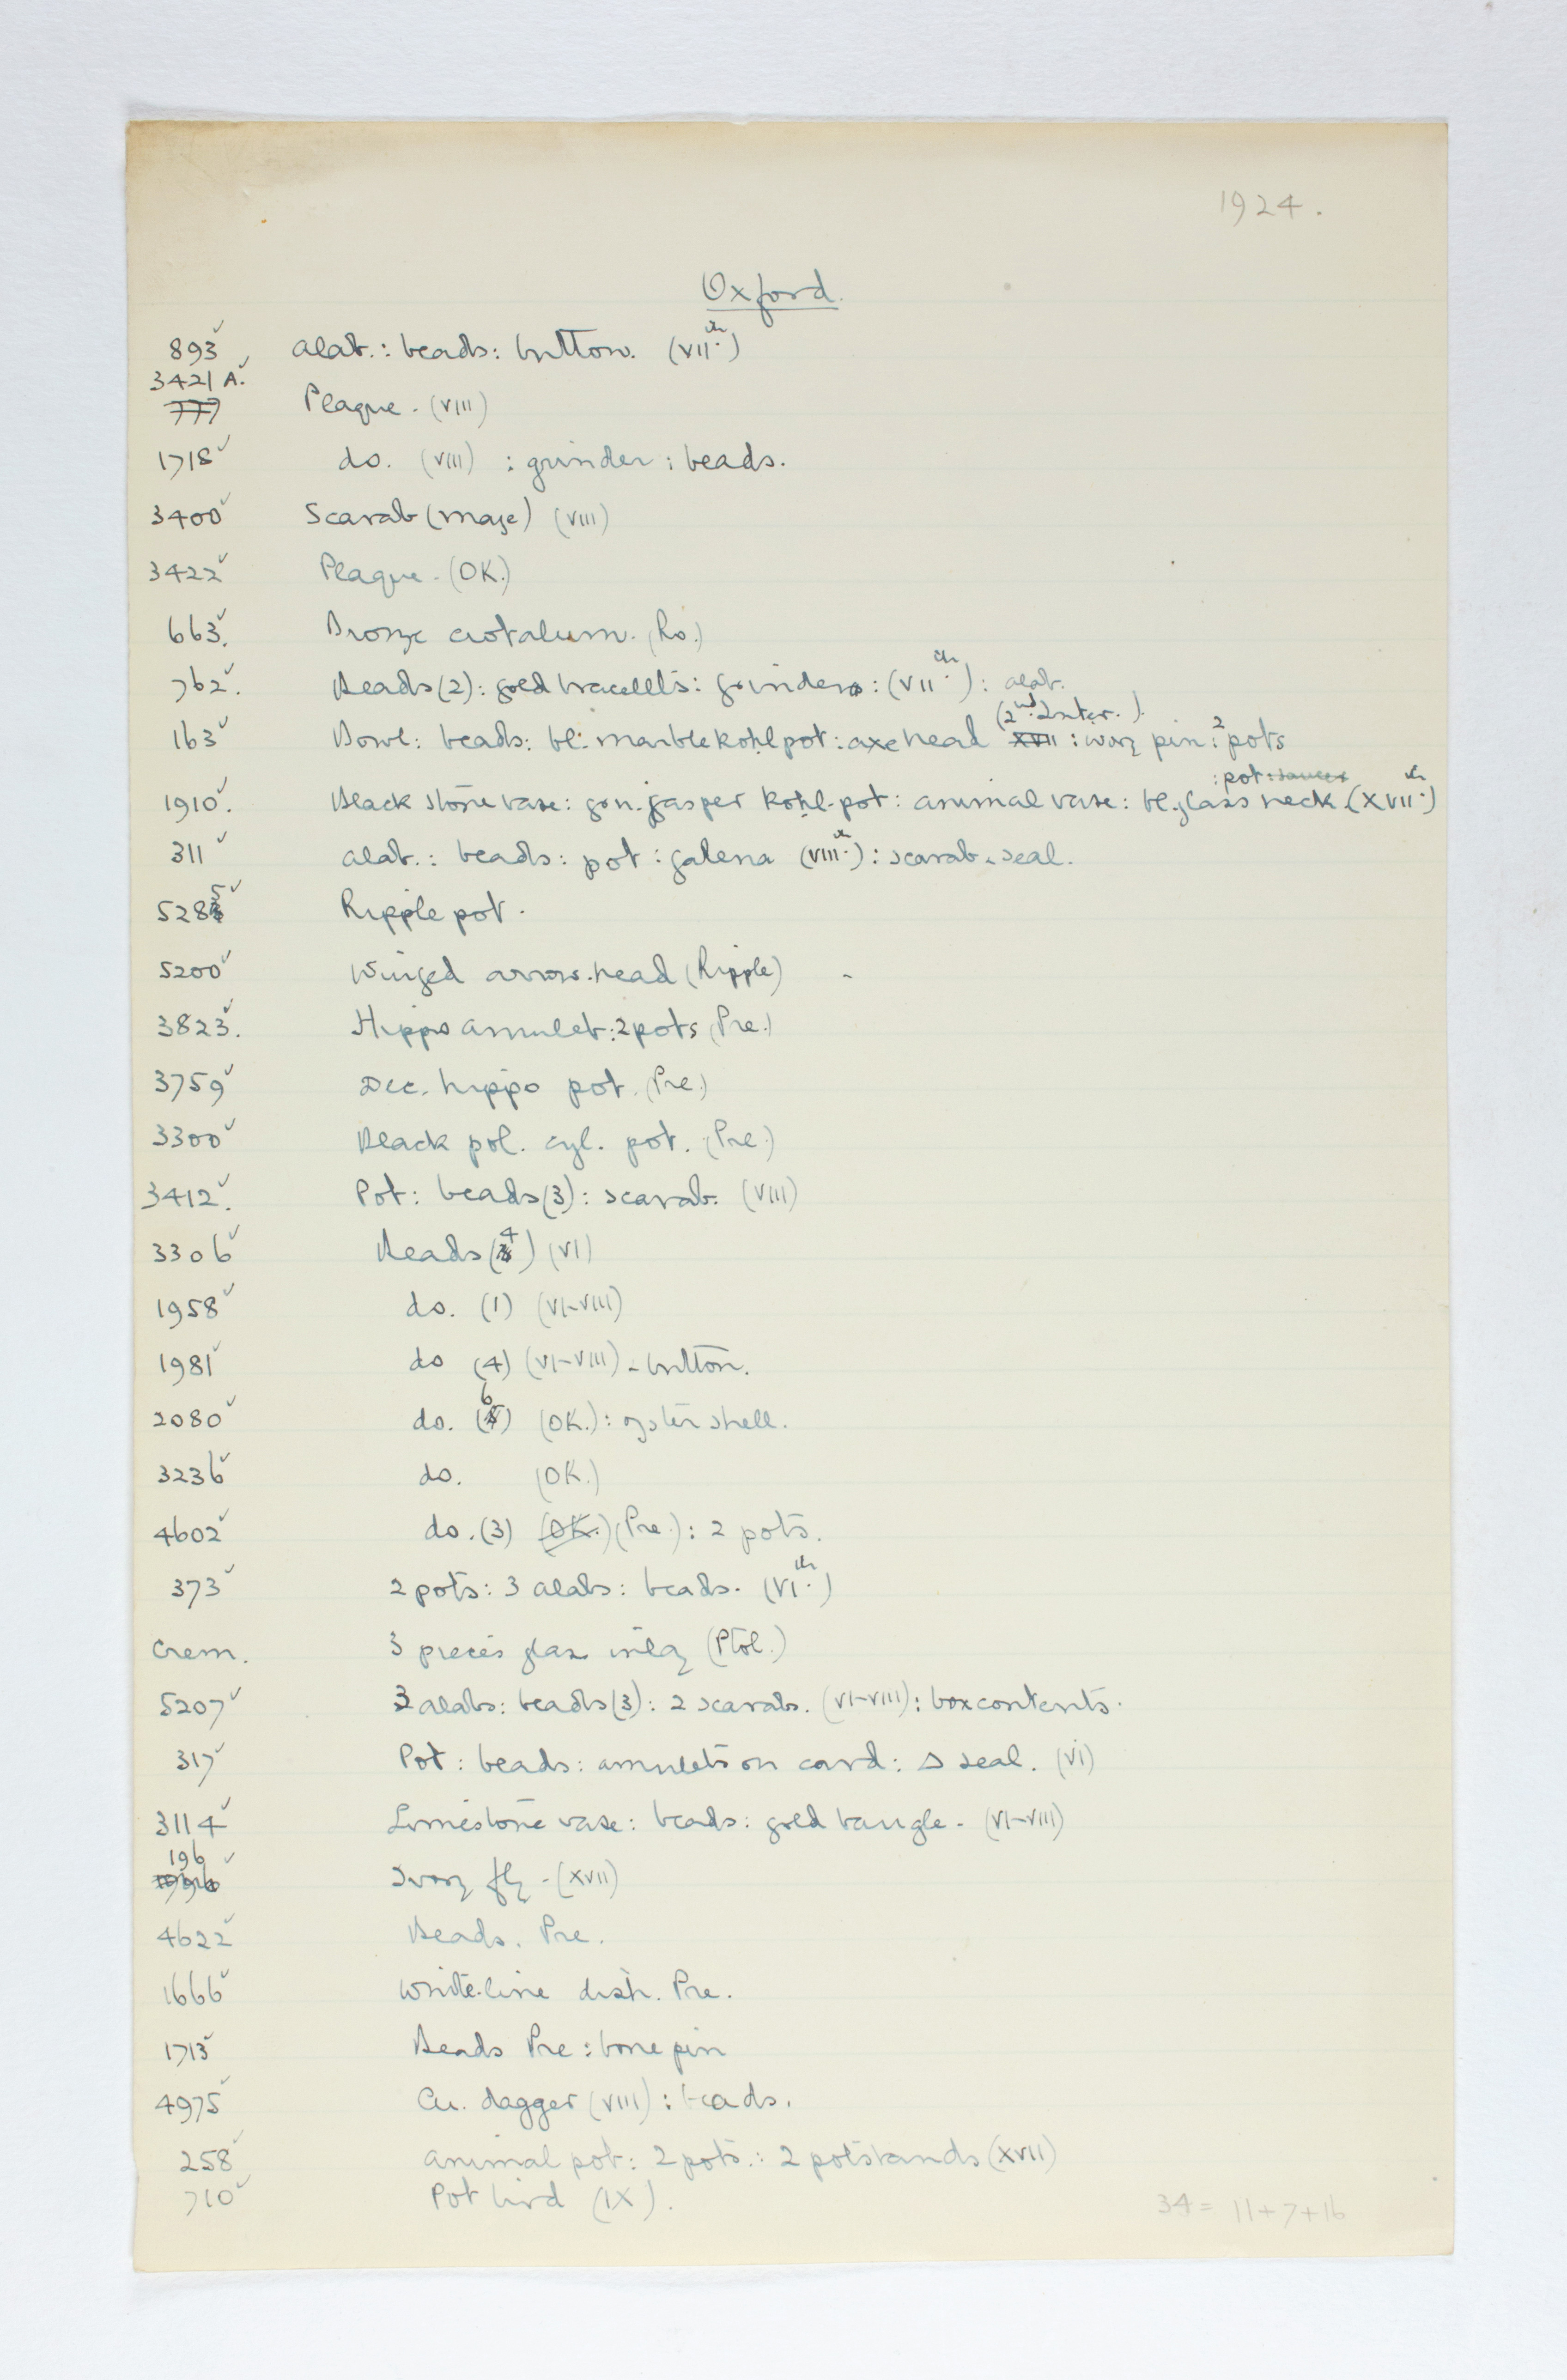 1923-24 Qau el-Kebir, Hemamieh Individual institution list PMA/WFP1/D/27/21